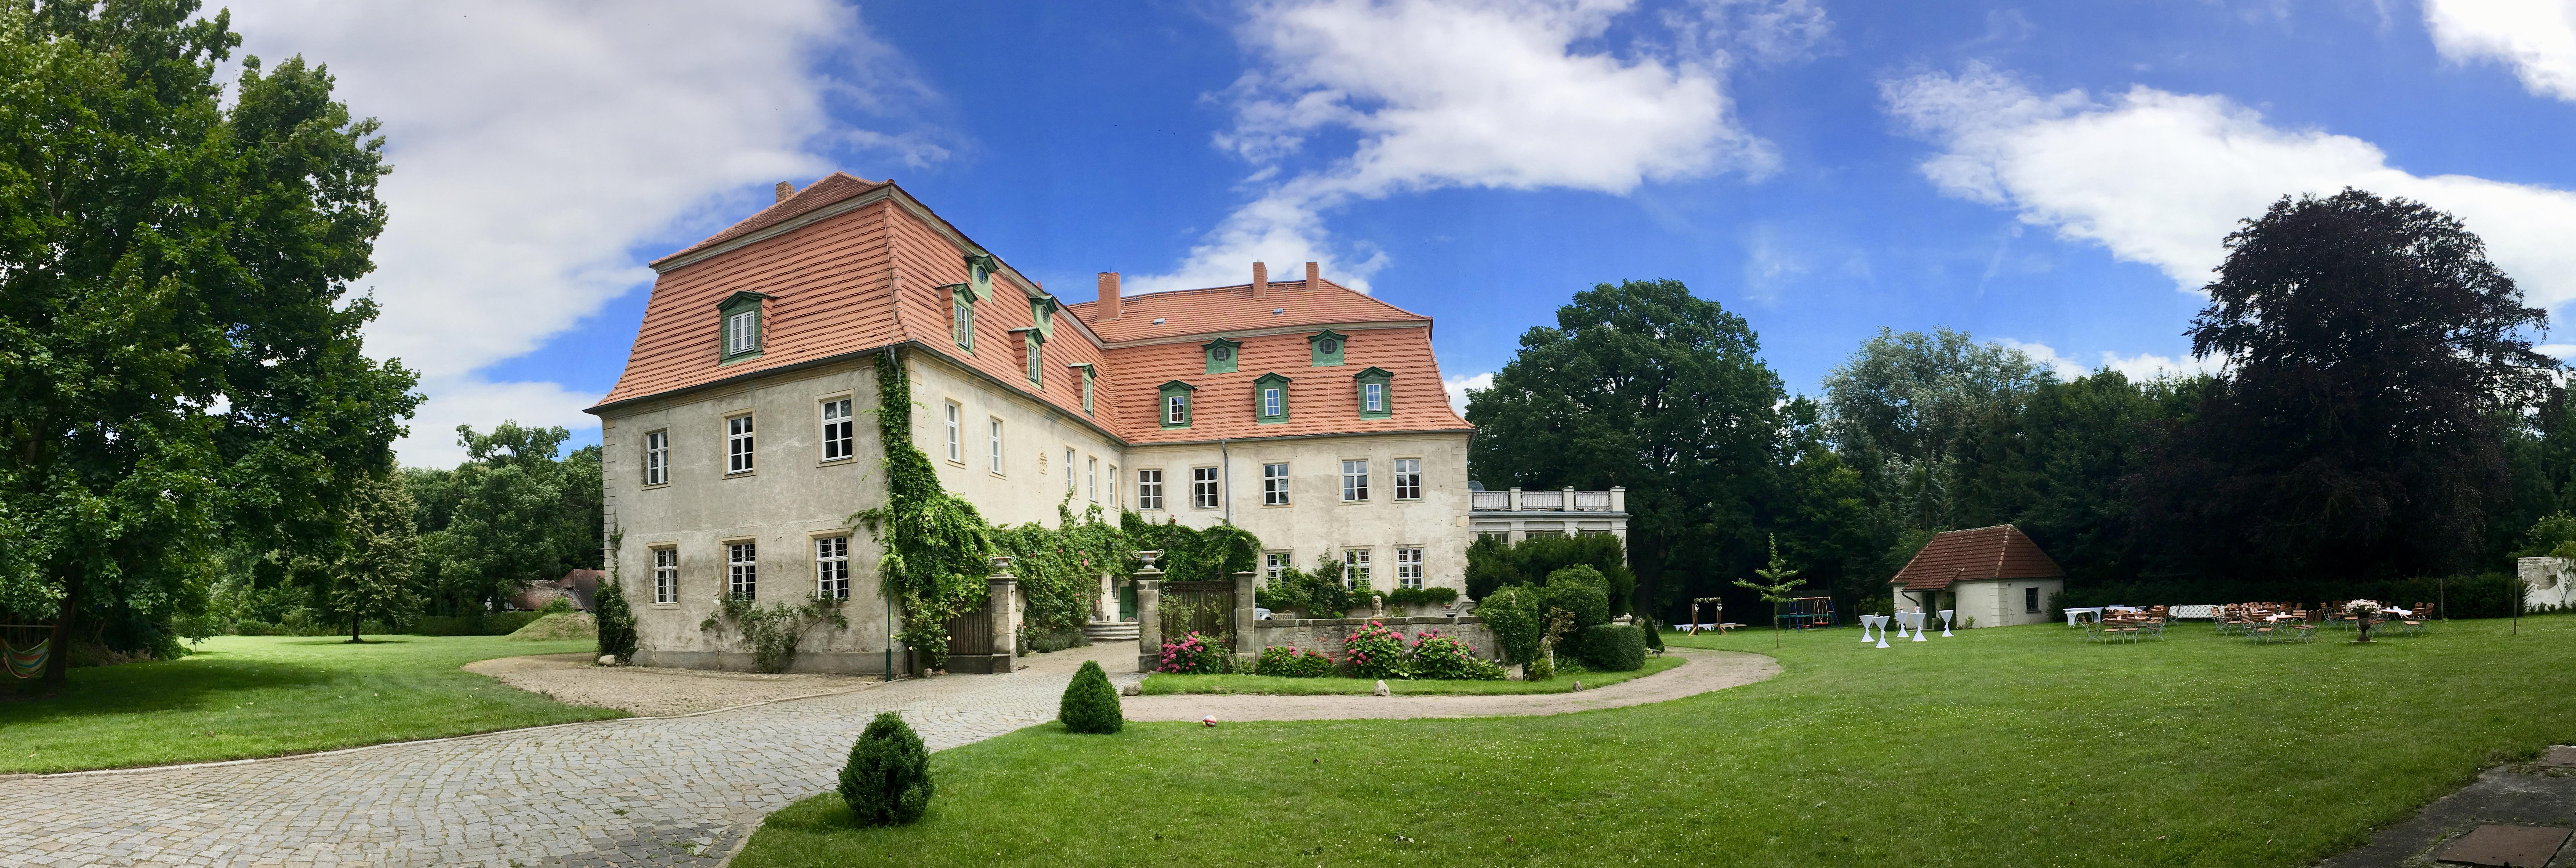 Schloss Ahlsdorf